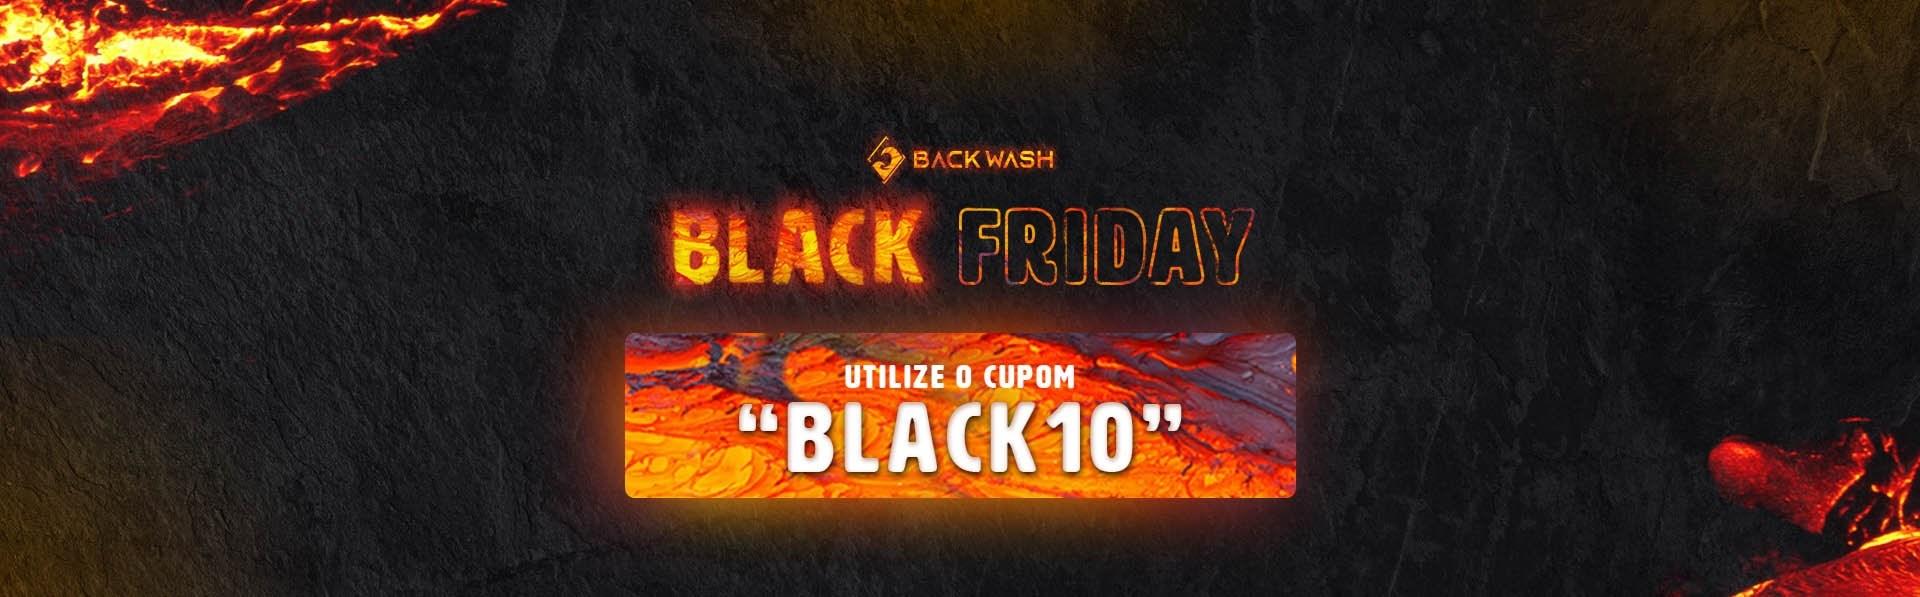 Black Friday Back Wash